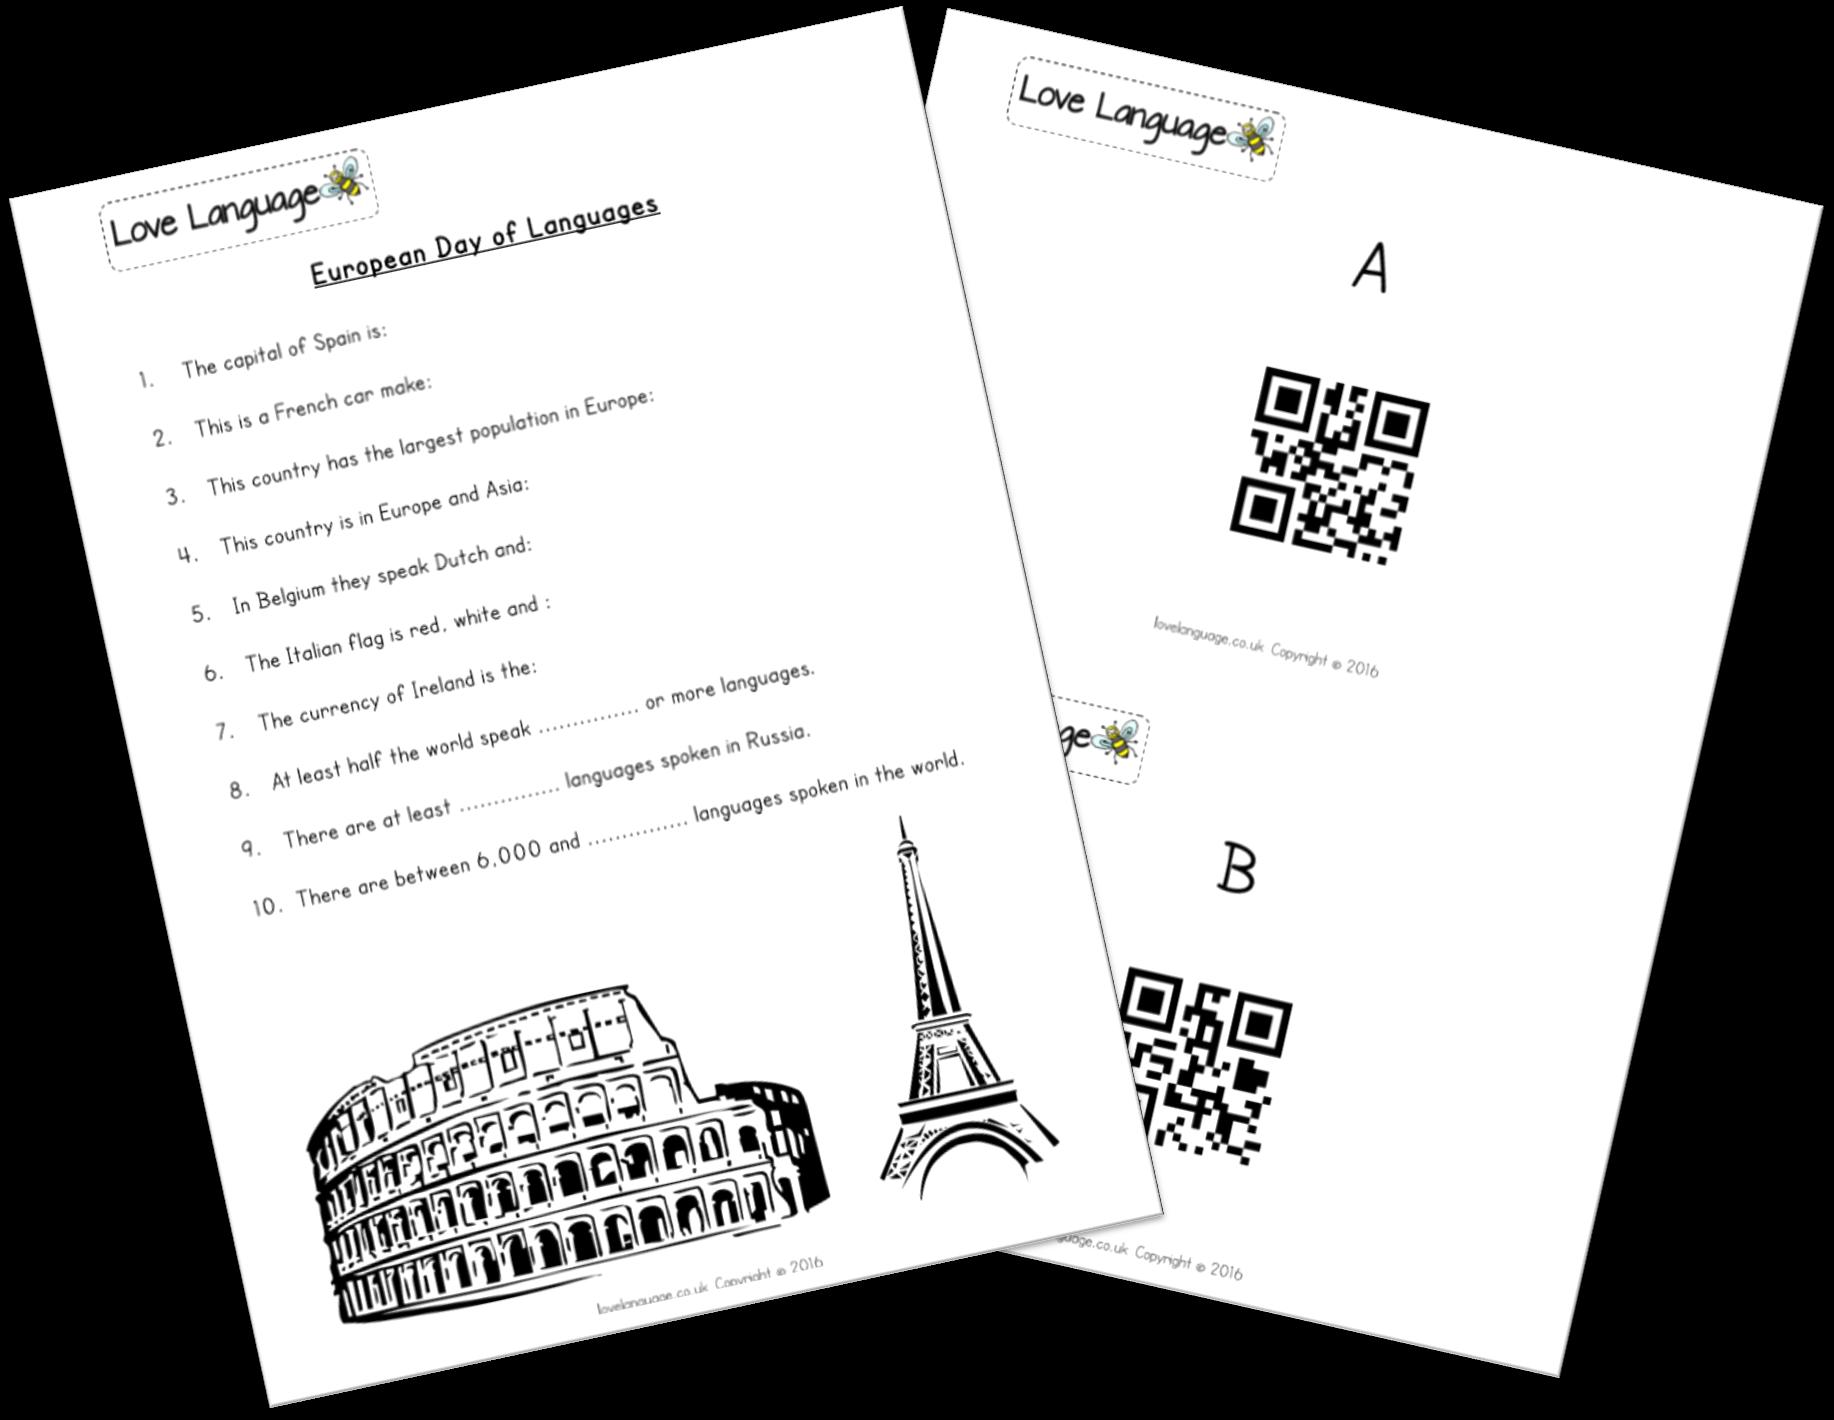 European Day of Languages QR Code Quiz - updated!